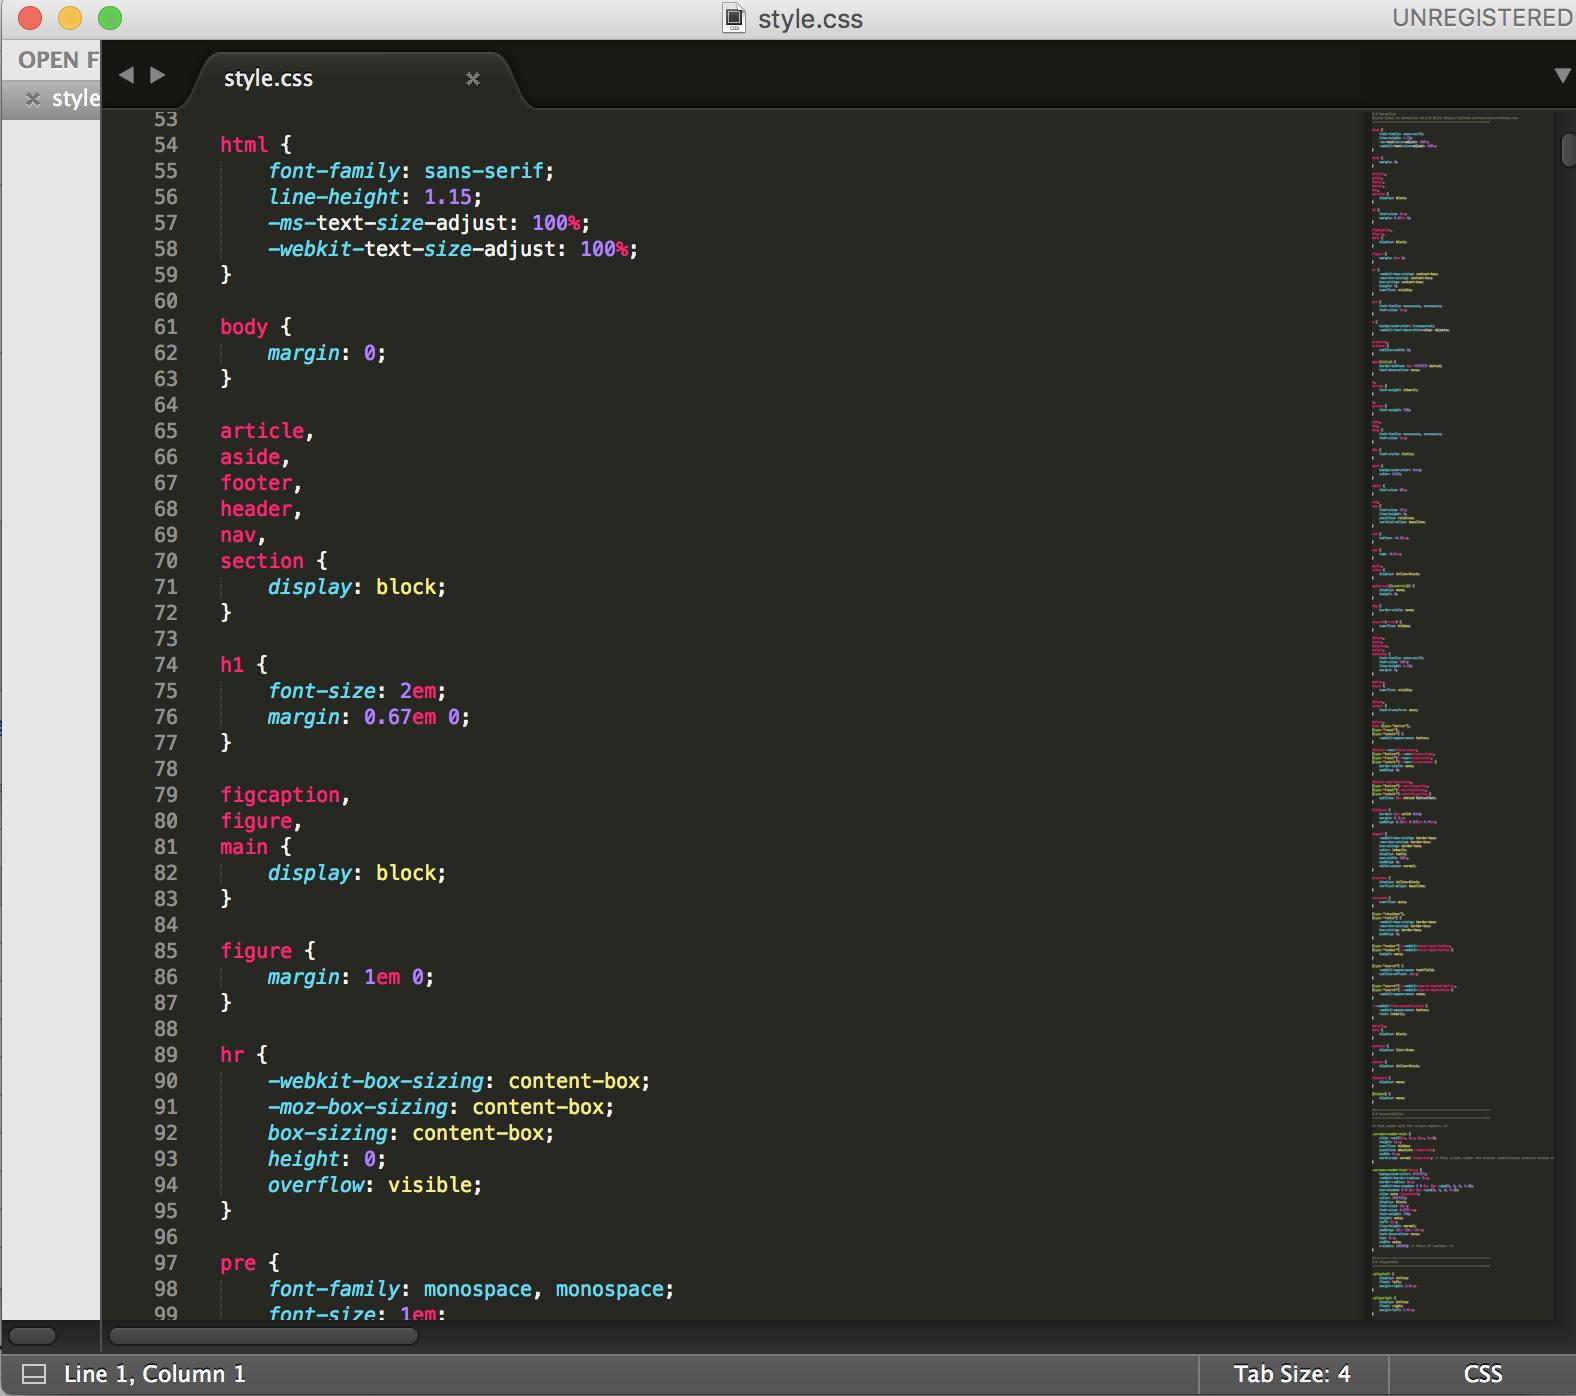 cuntom - WordPressのカスタマイズでオススメ本と簡単なやり方まとめ